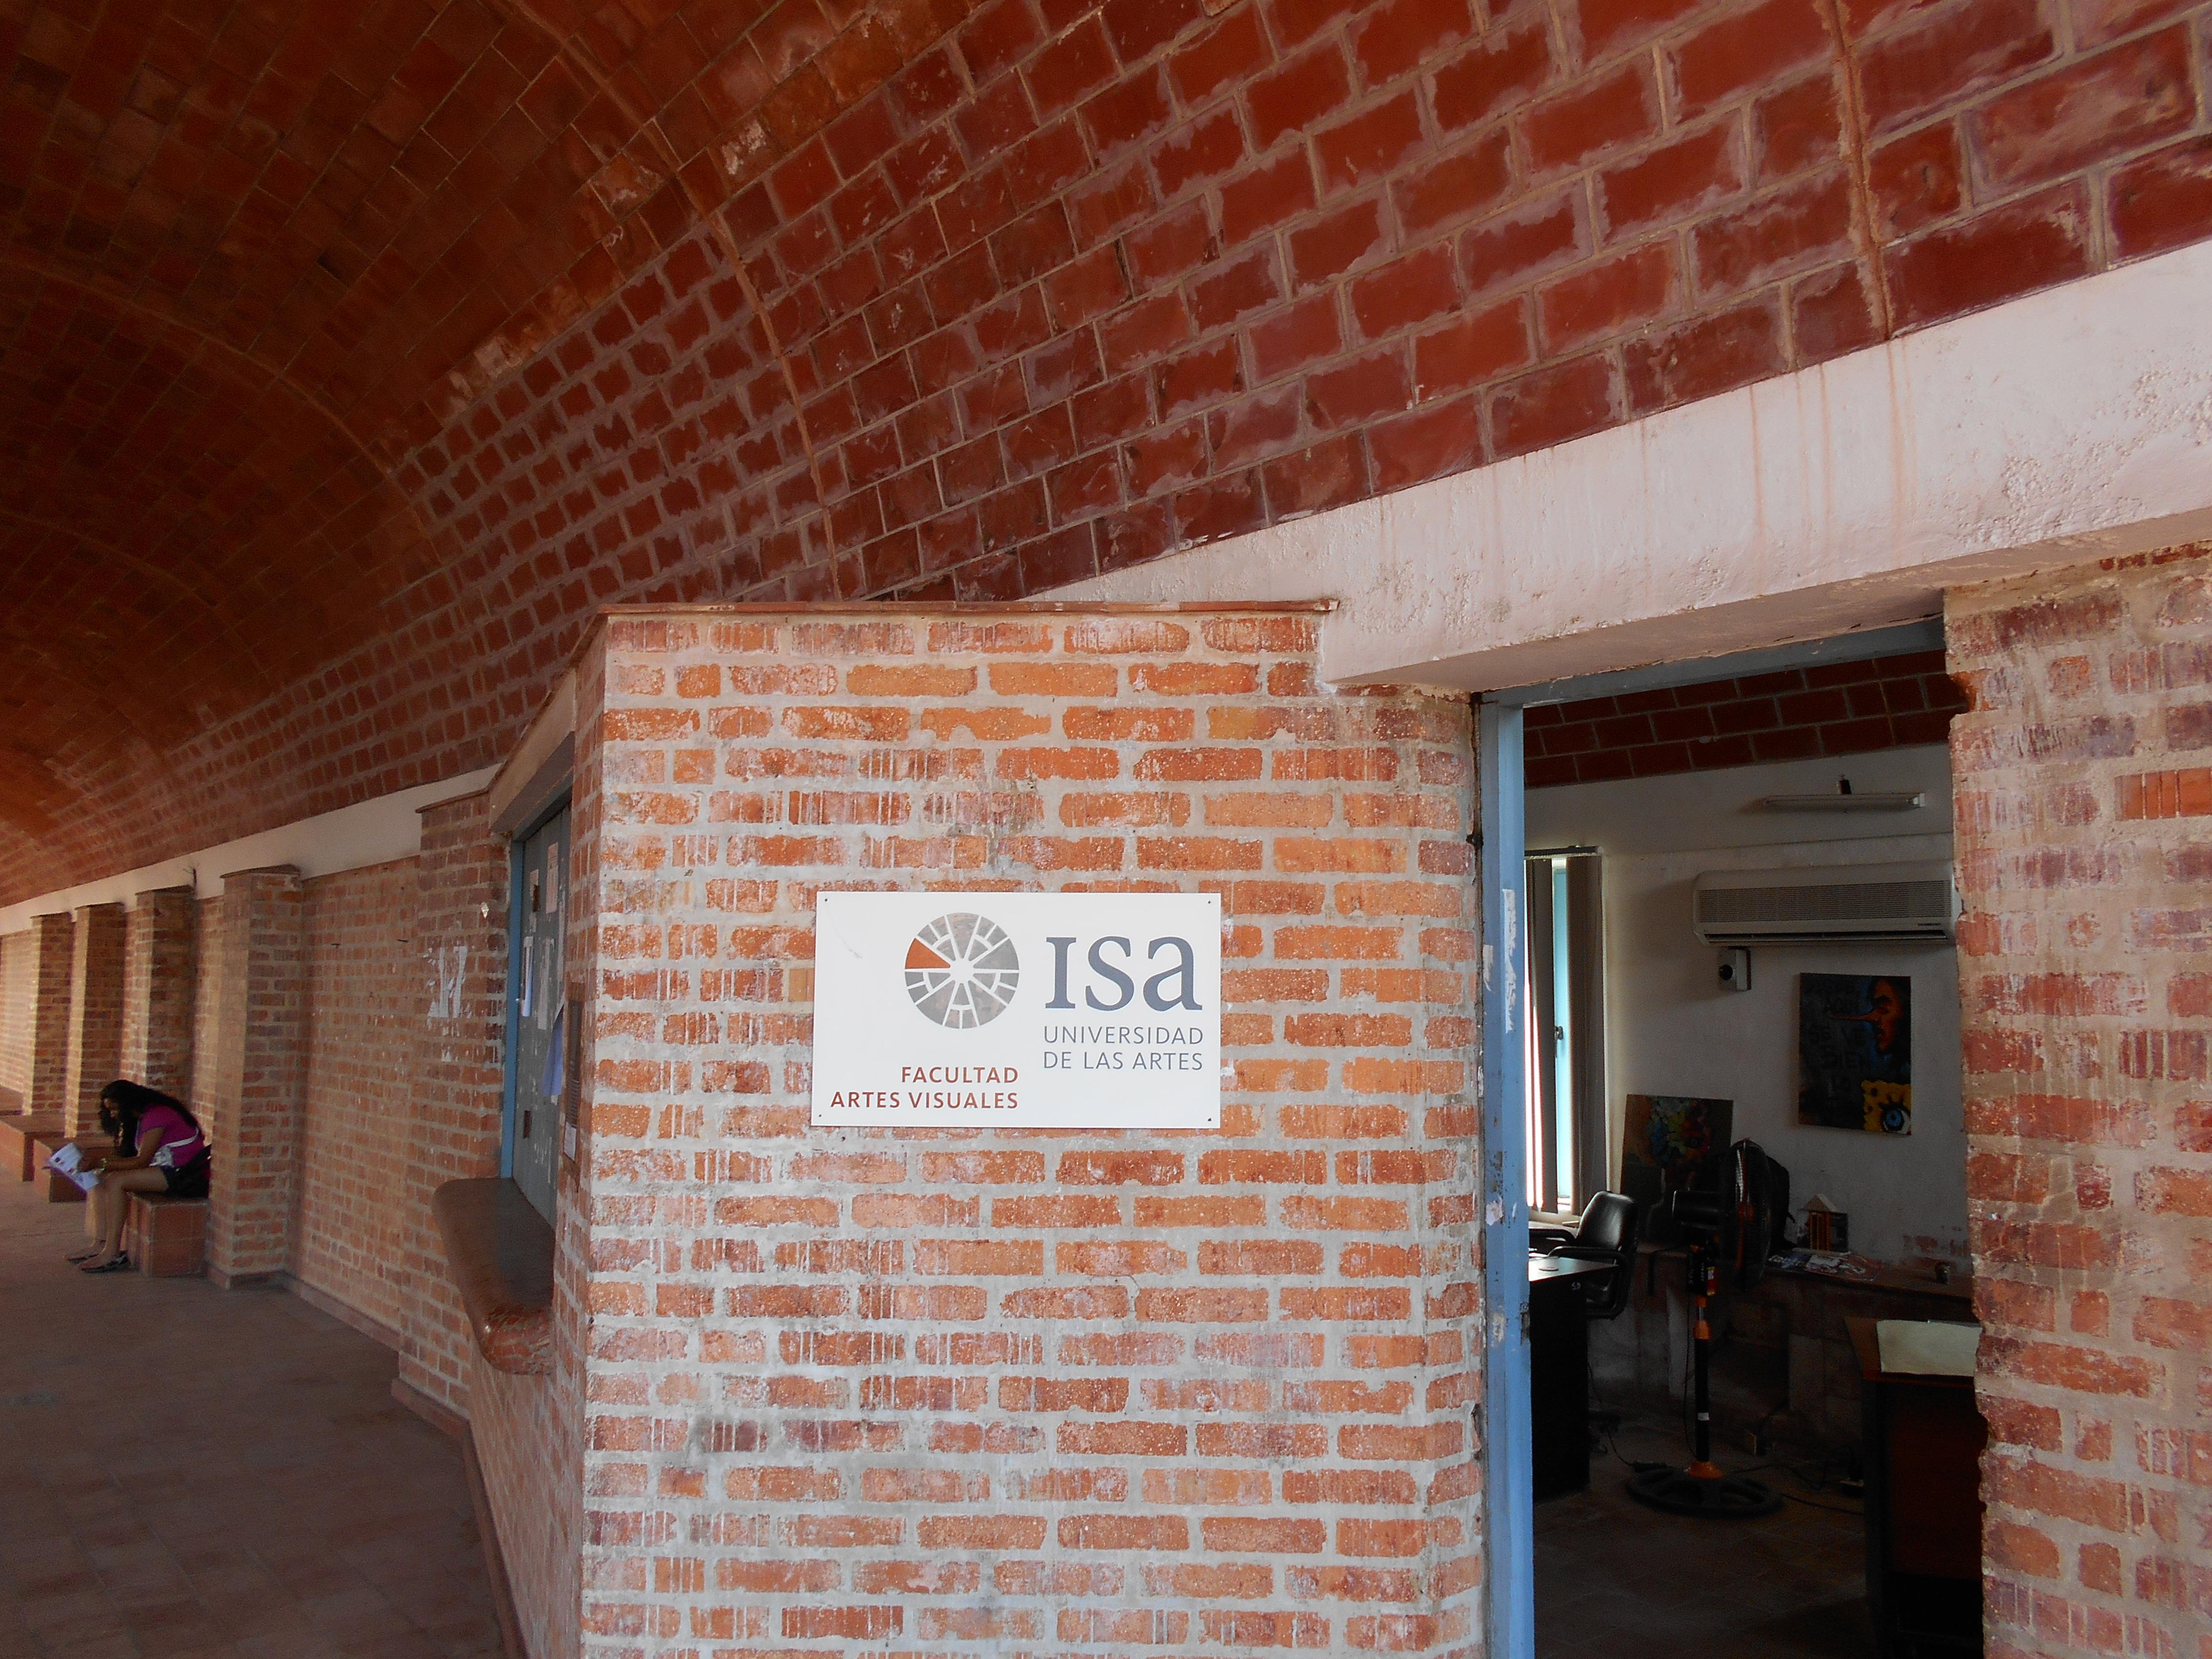 ISA University of the Arts